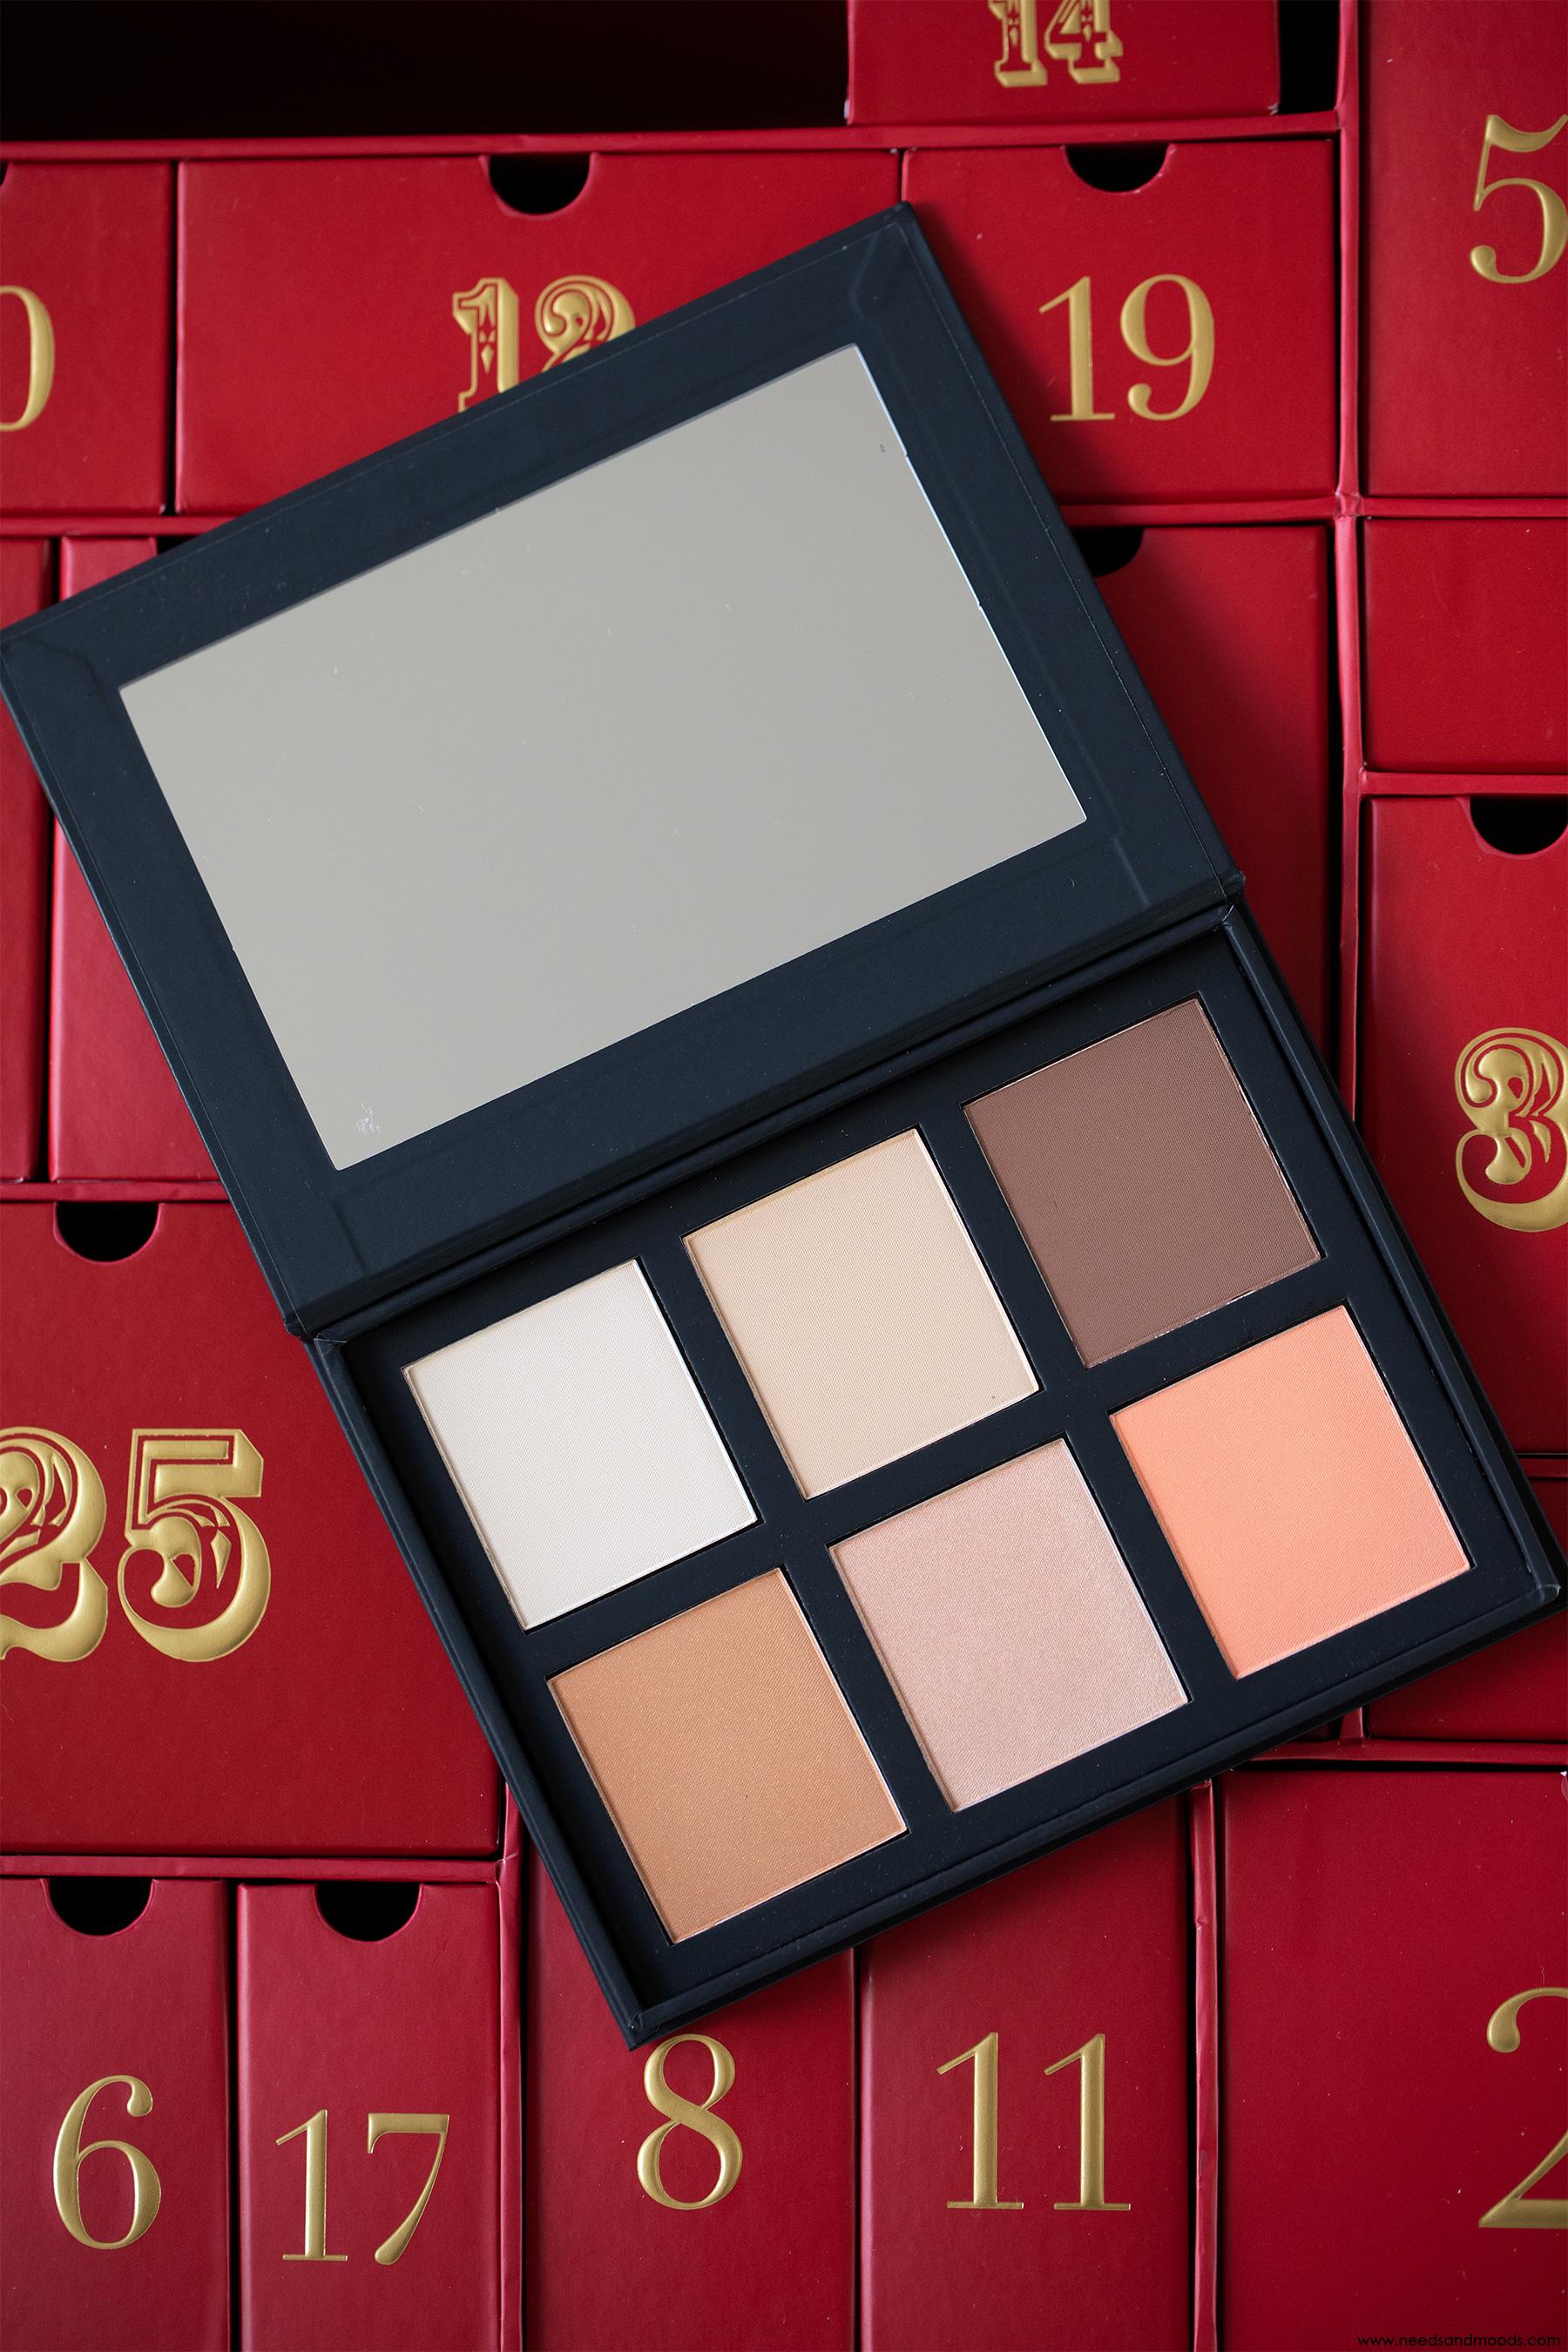 lookfantastic calendrier avent 2018 palette makeup